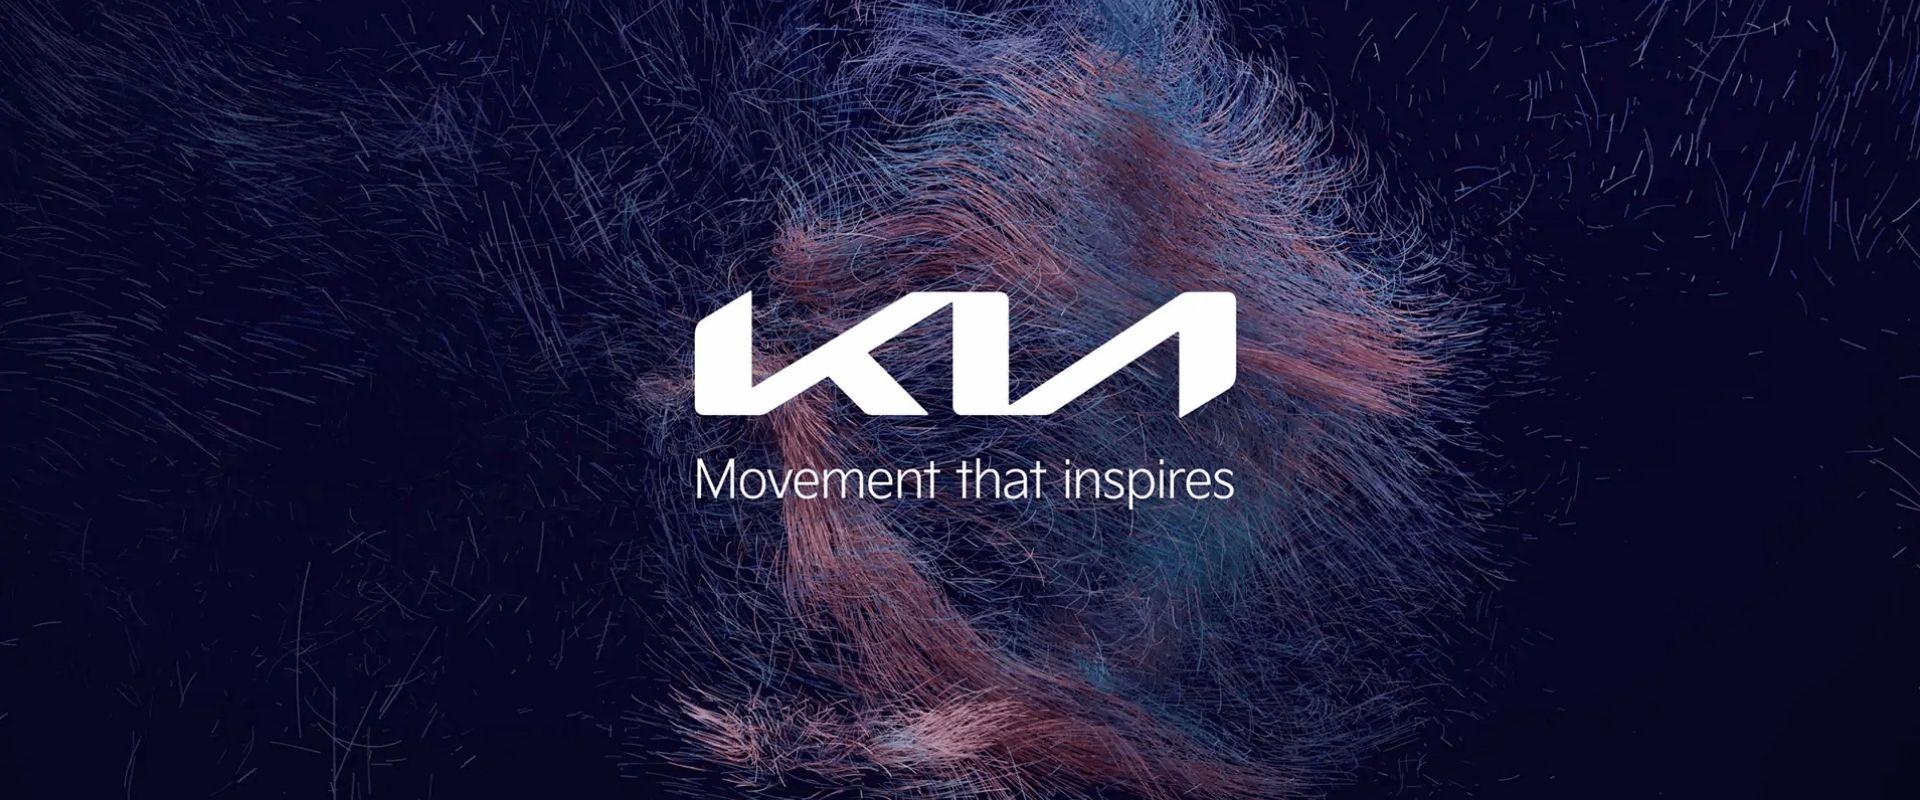 Kia. Movement that Inspires